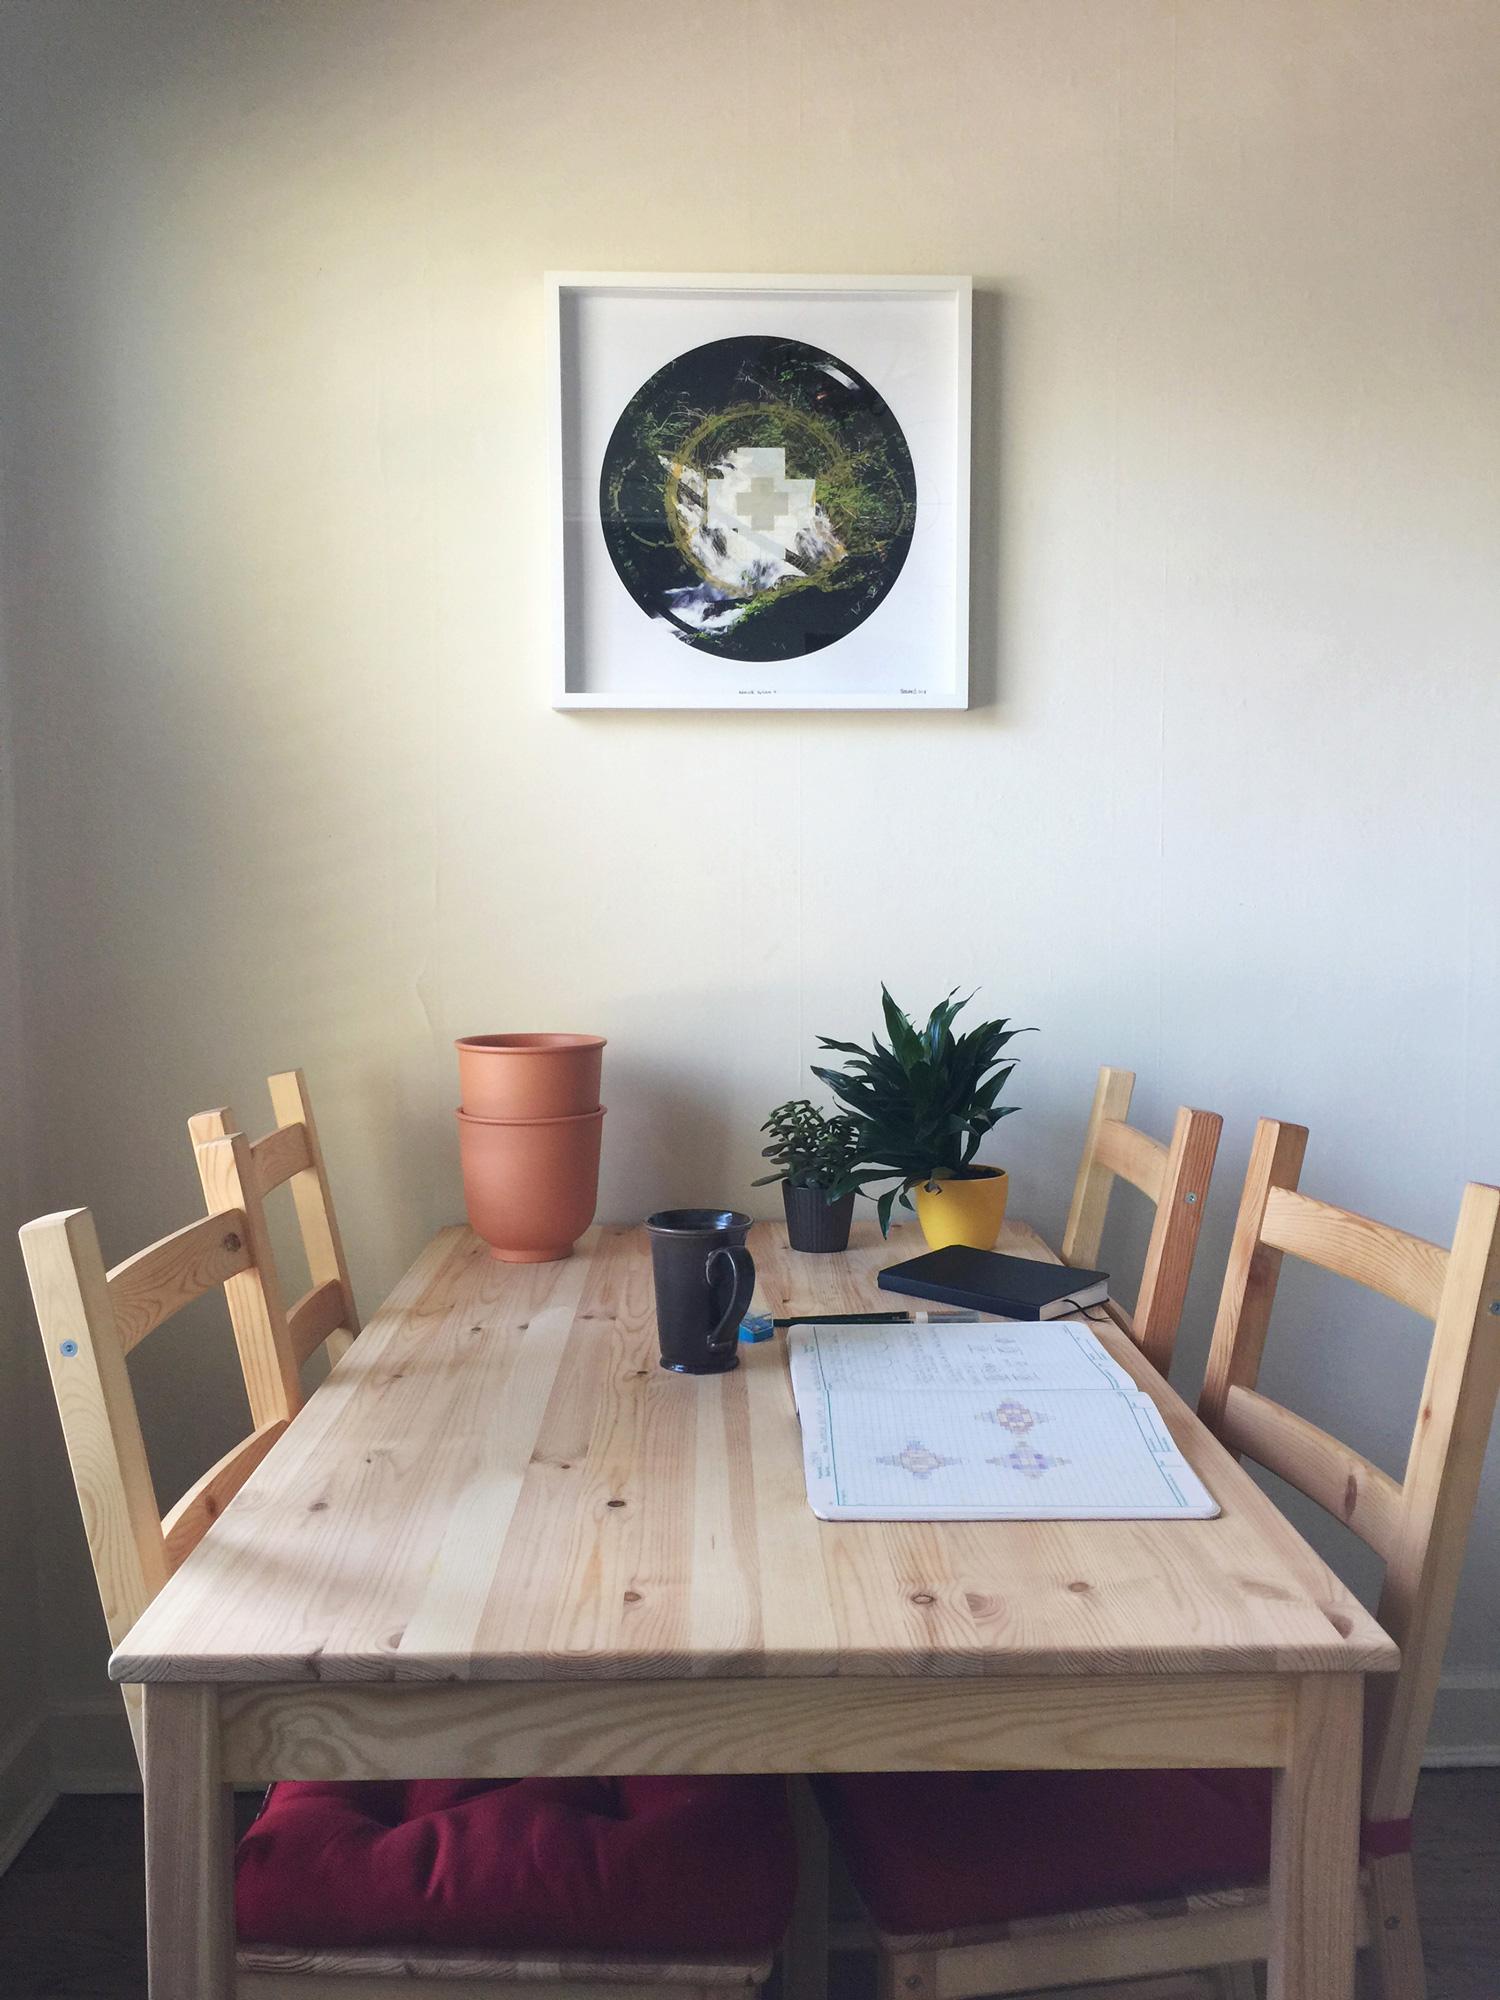 Rainier-Botany-9-on-wall.jpg